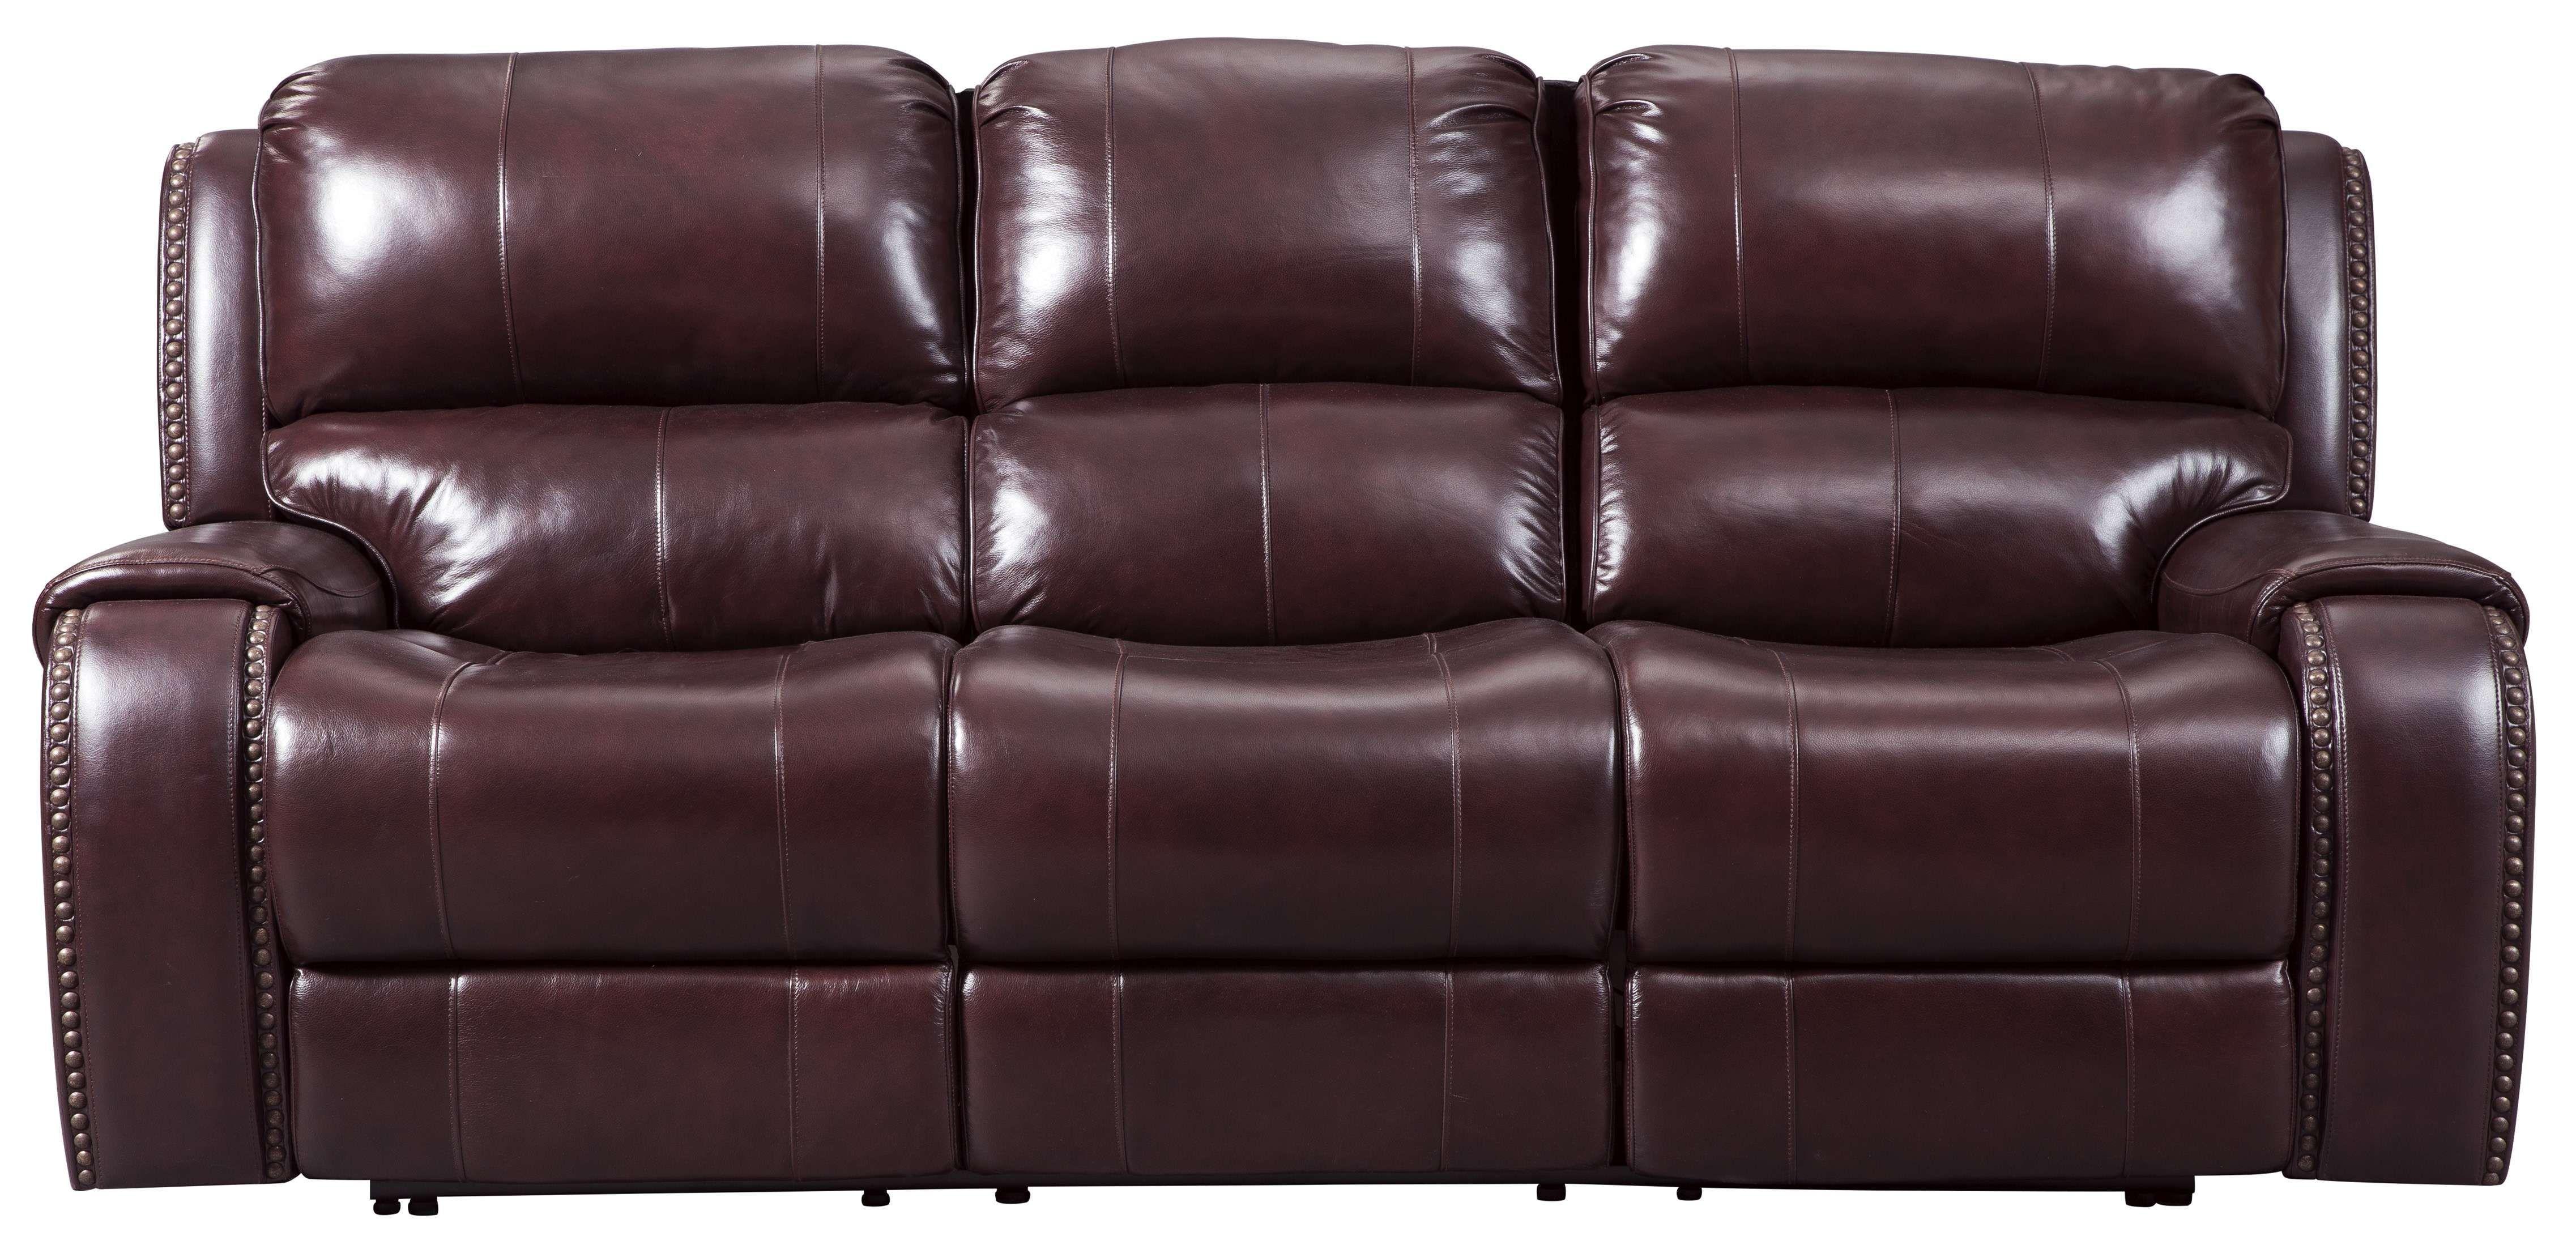 Gilmanton Burgundy Power Reclining Sofa with Adjustable Headrest